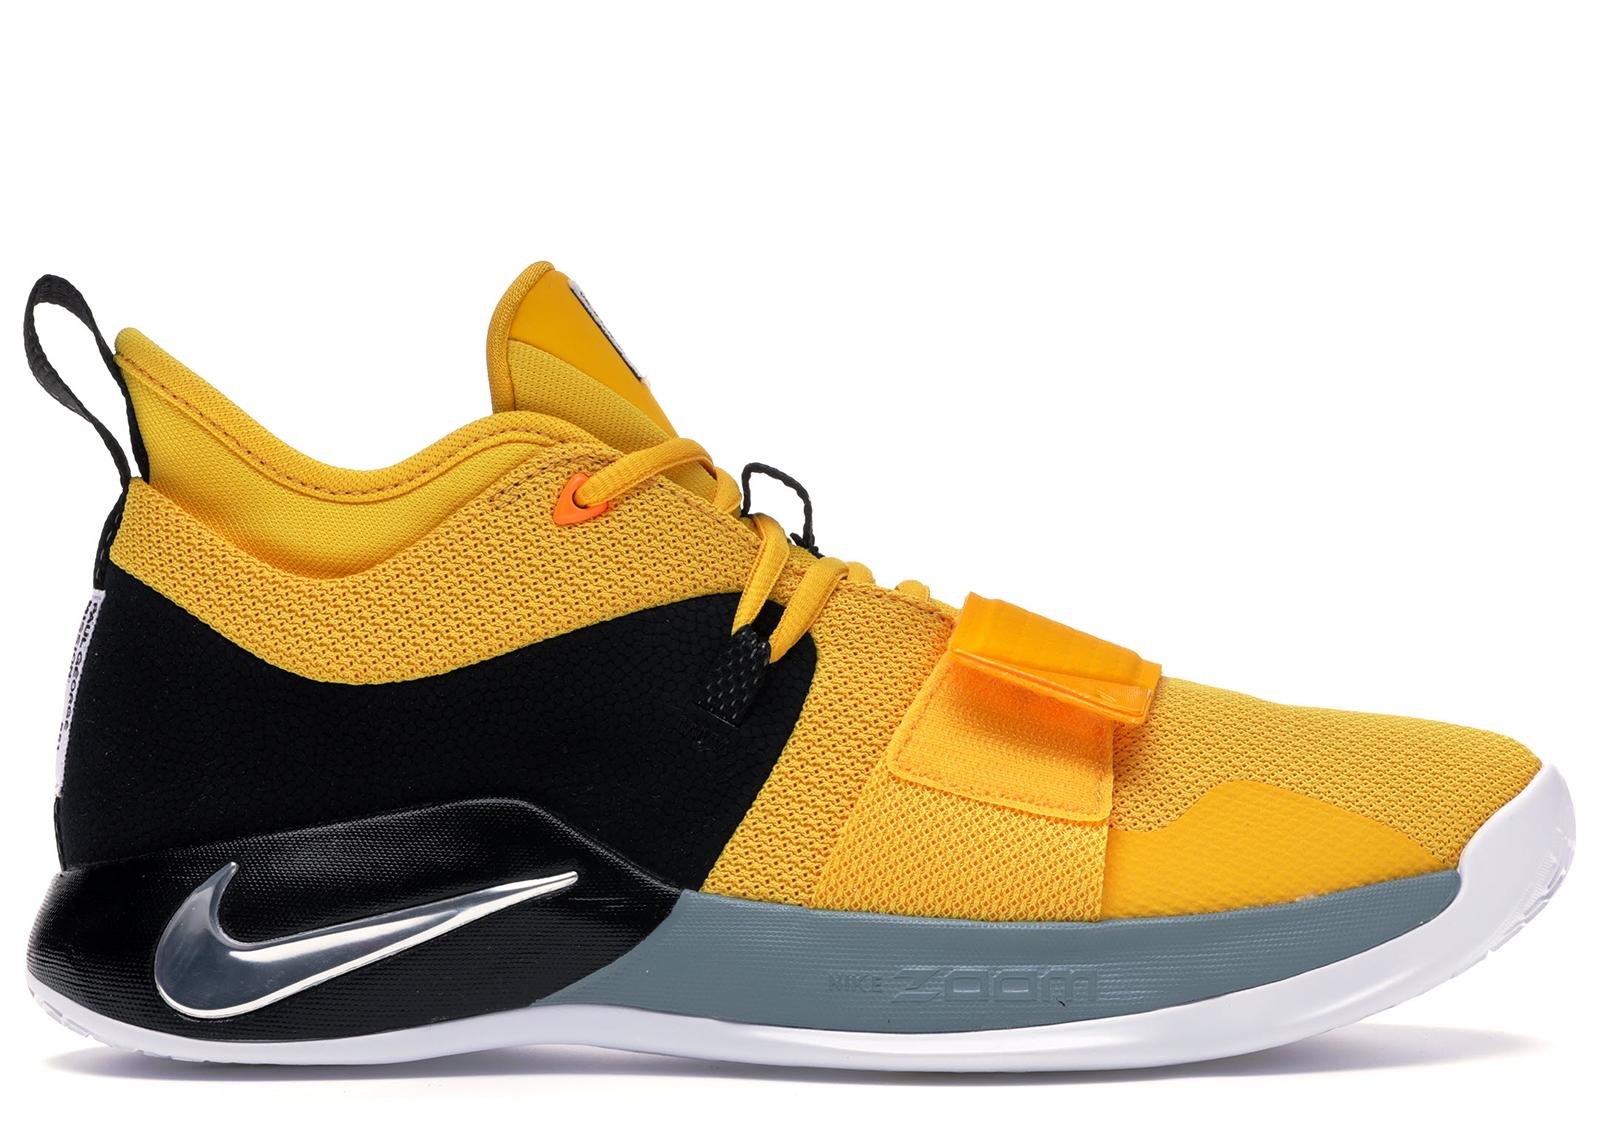 Nike PG 2.5 Moon Exploration - AJ2039